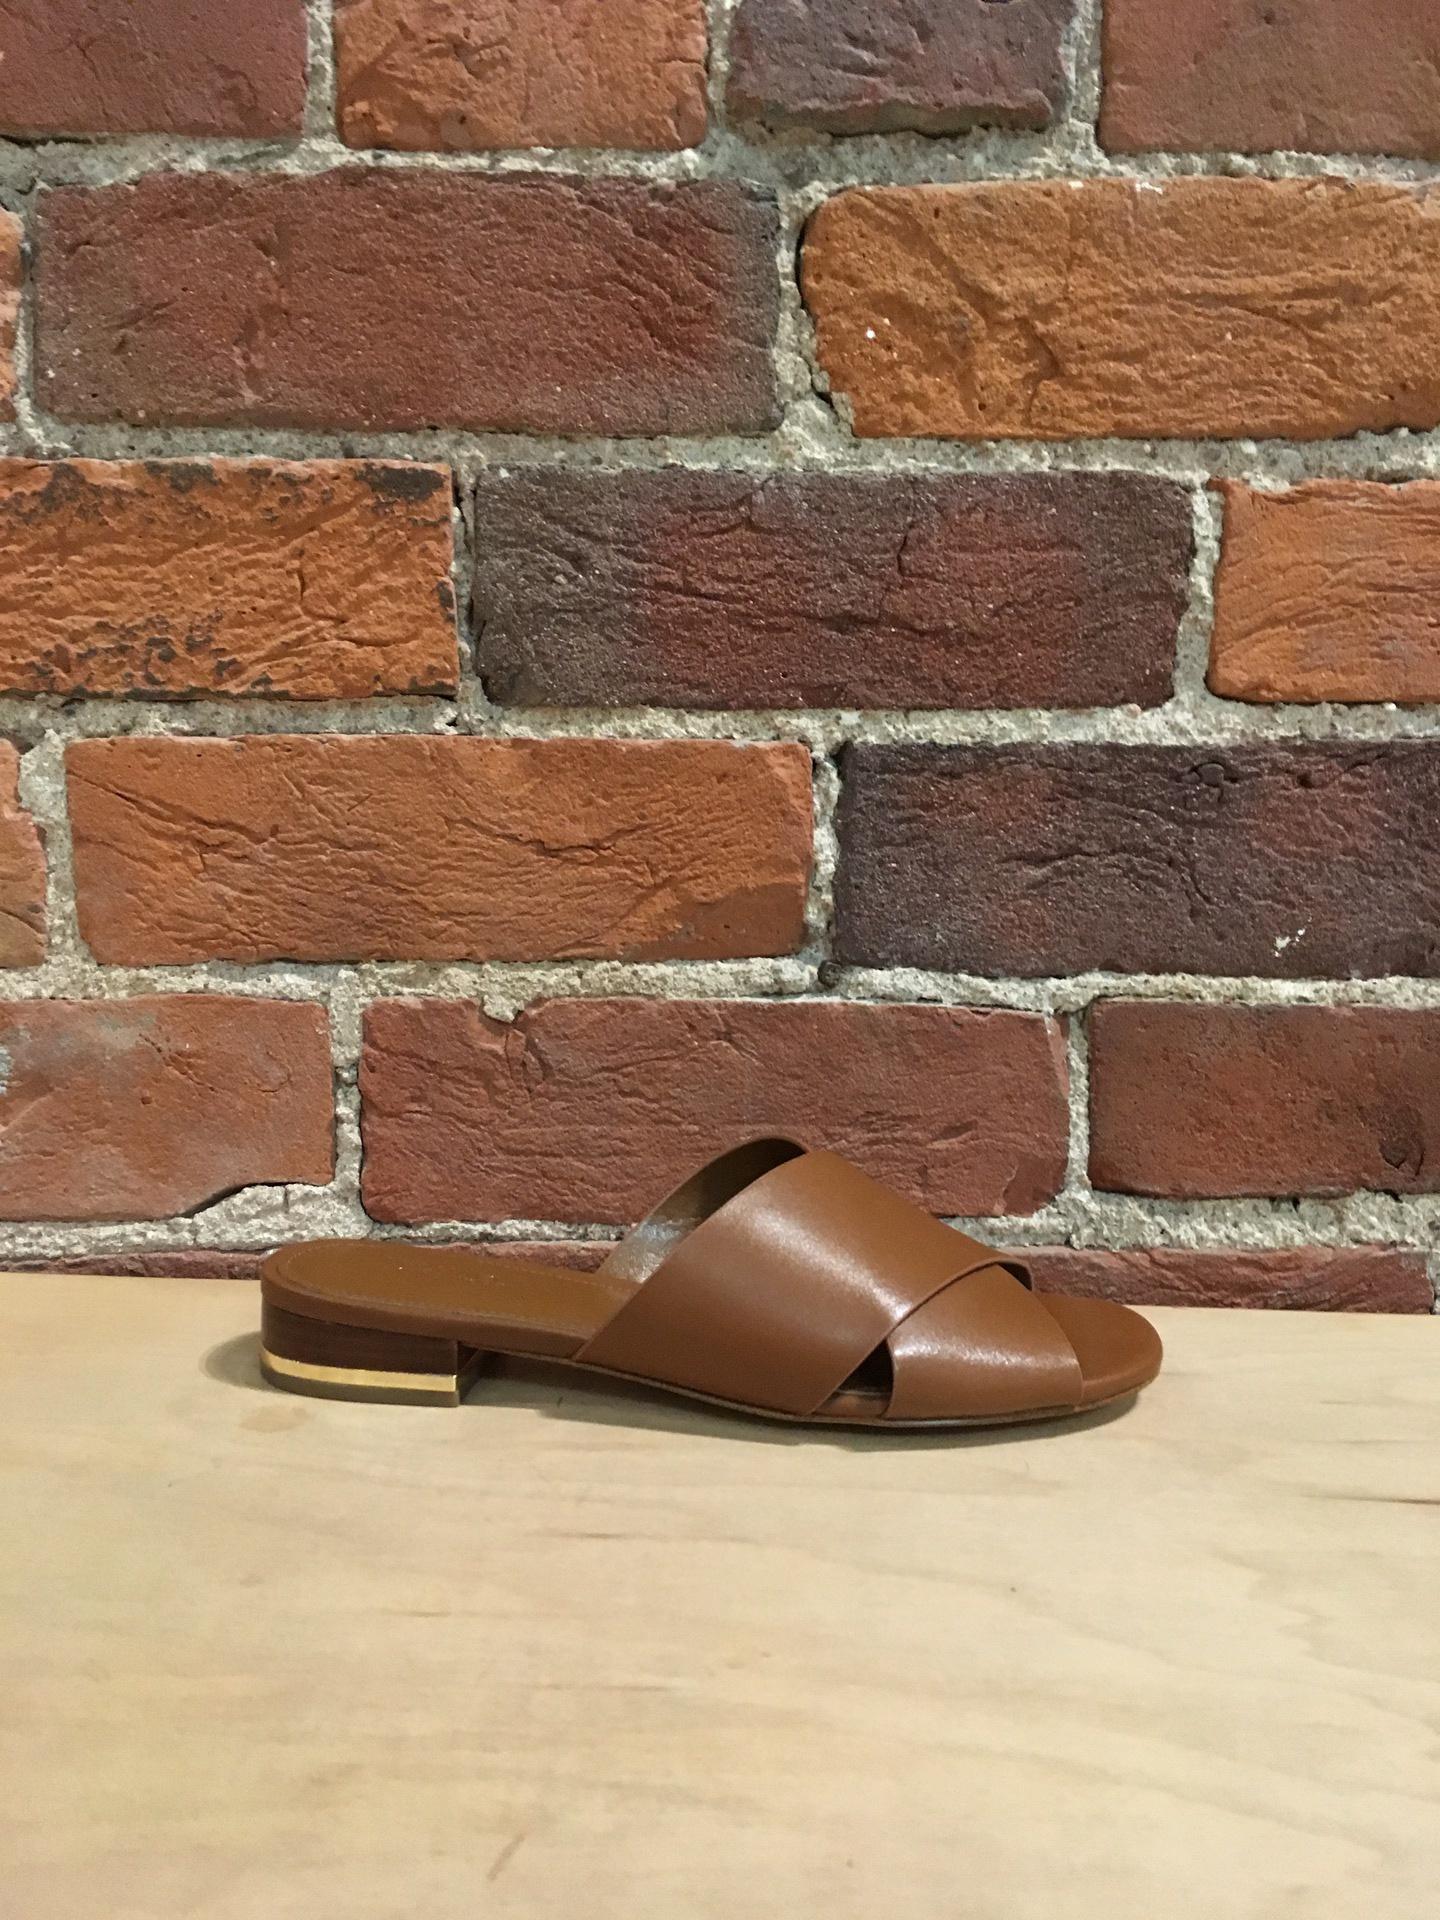 49c3f0af8047e4 MICHAEL KORS - SHELLY FLAT SANDAL IN LUGGAGE - the Urban Shoe Myth